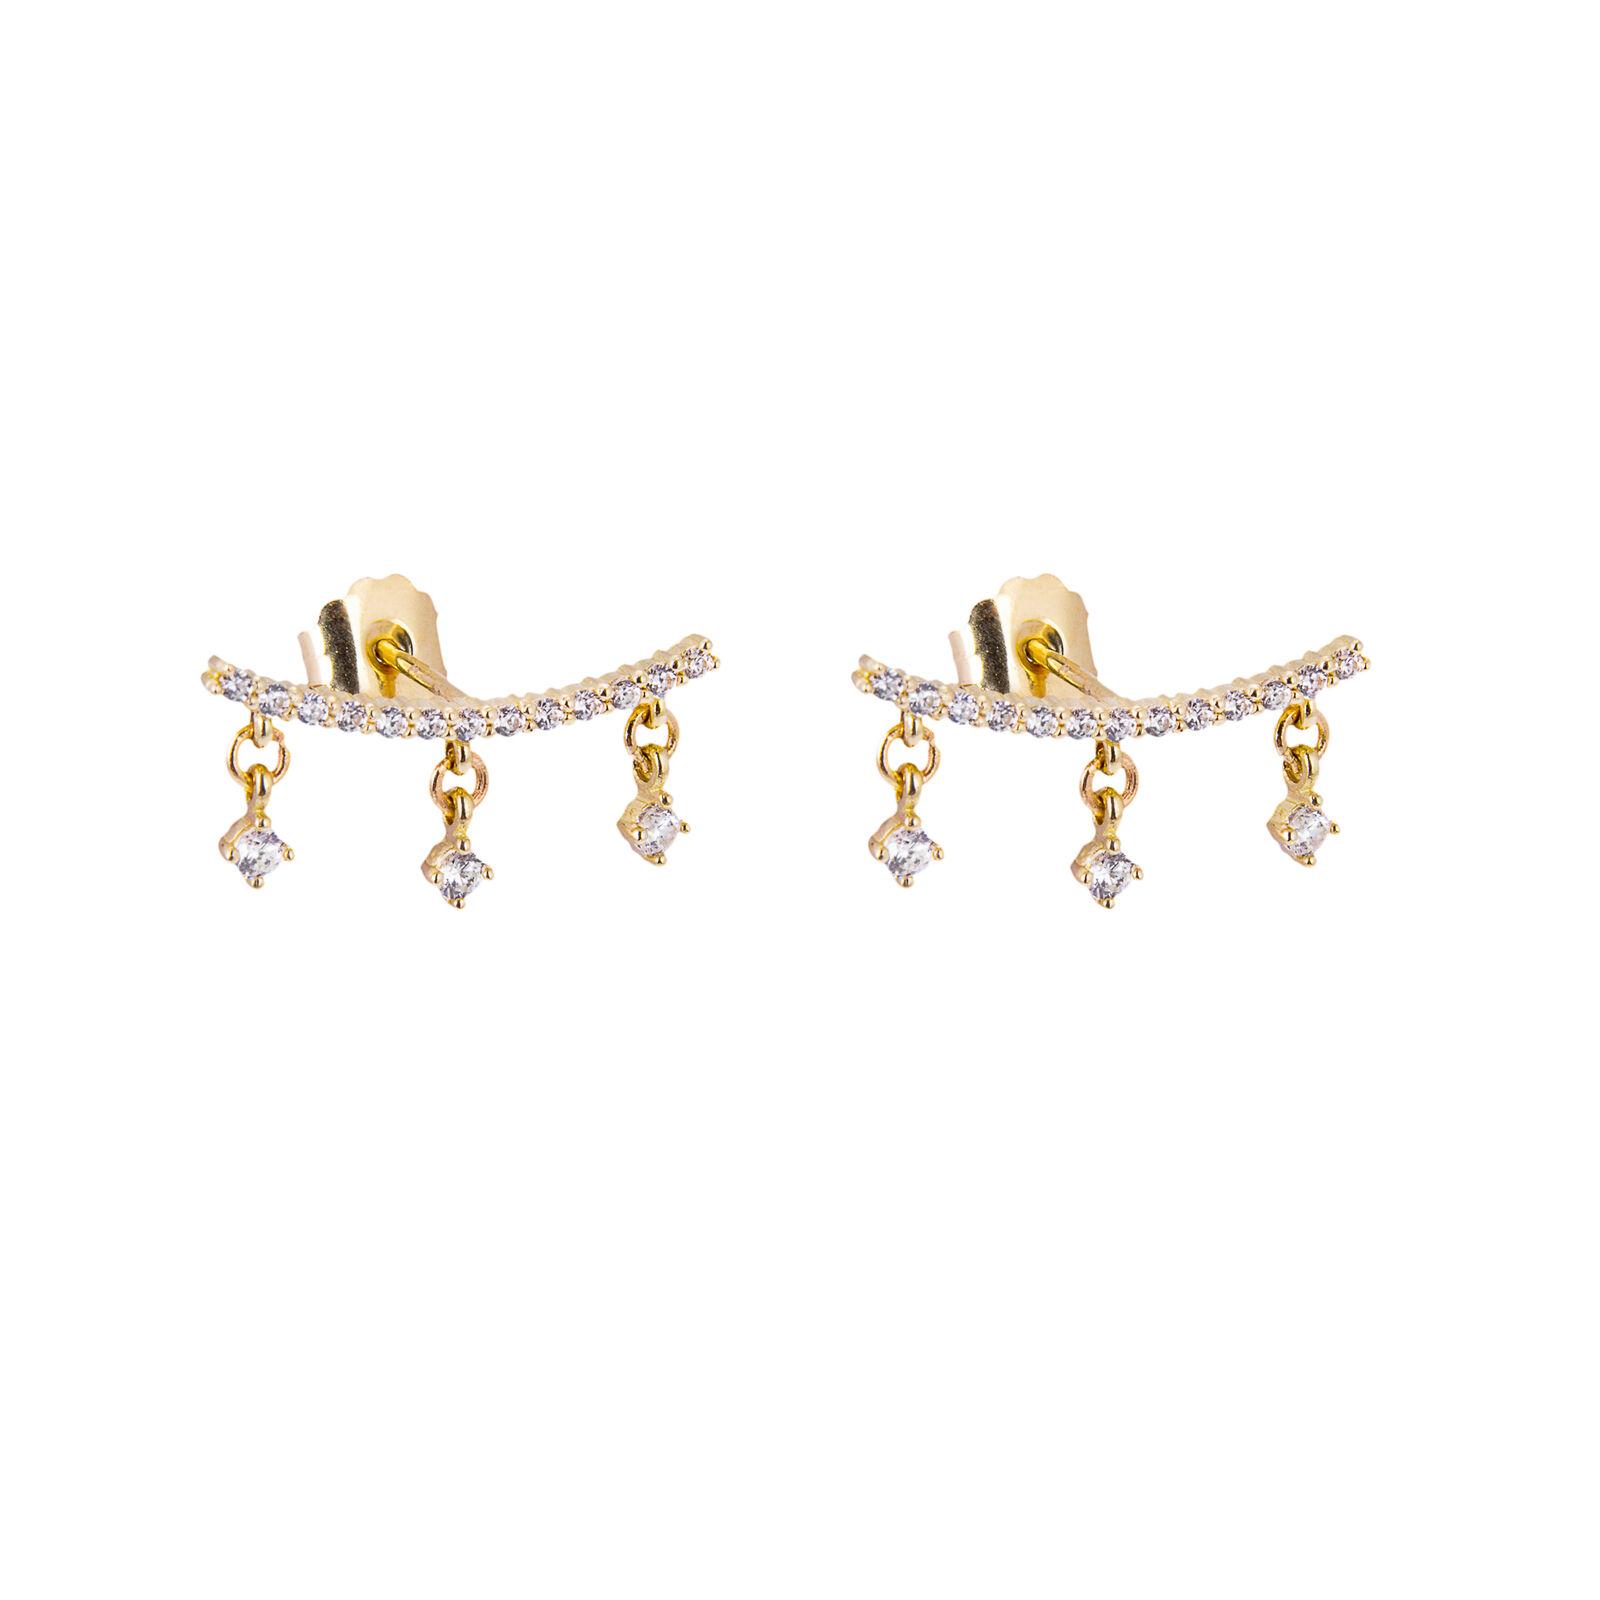 9ct gold Clear CZ Climber Dangle Stud Earrings